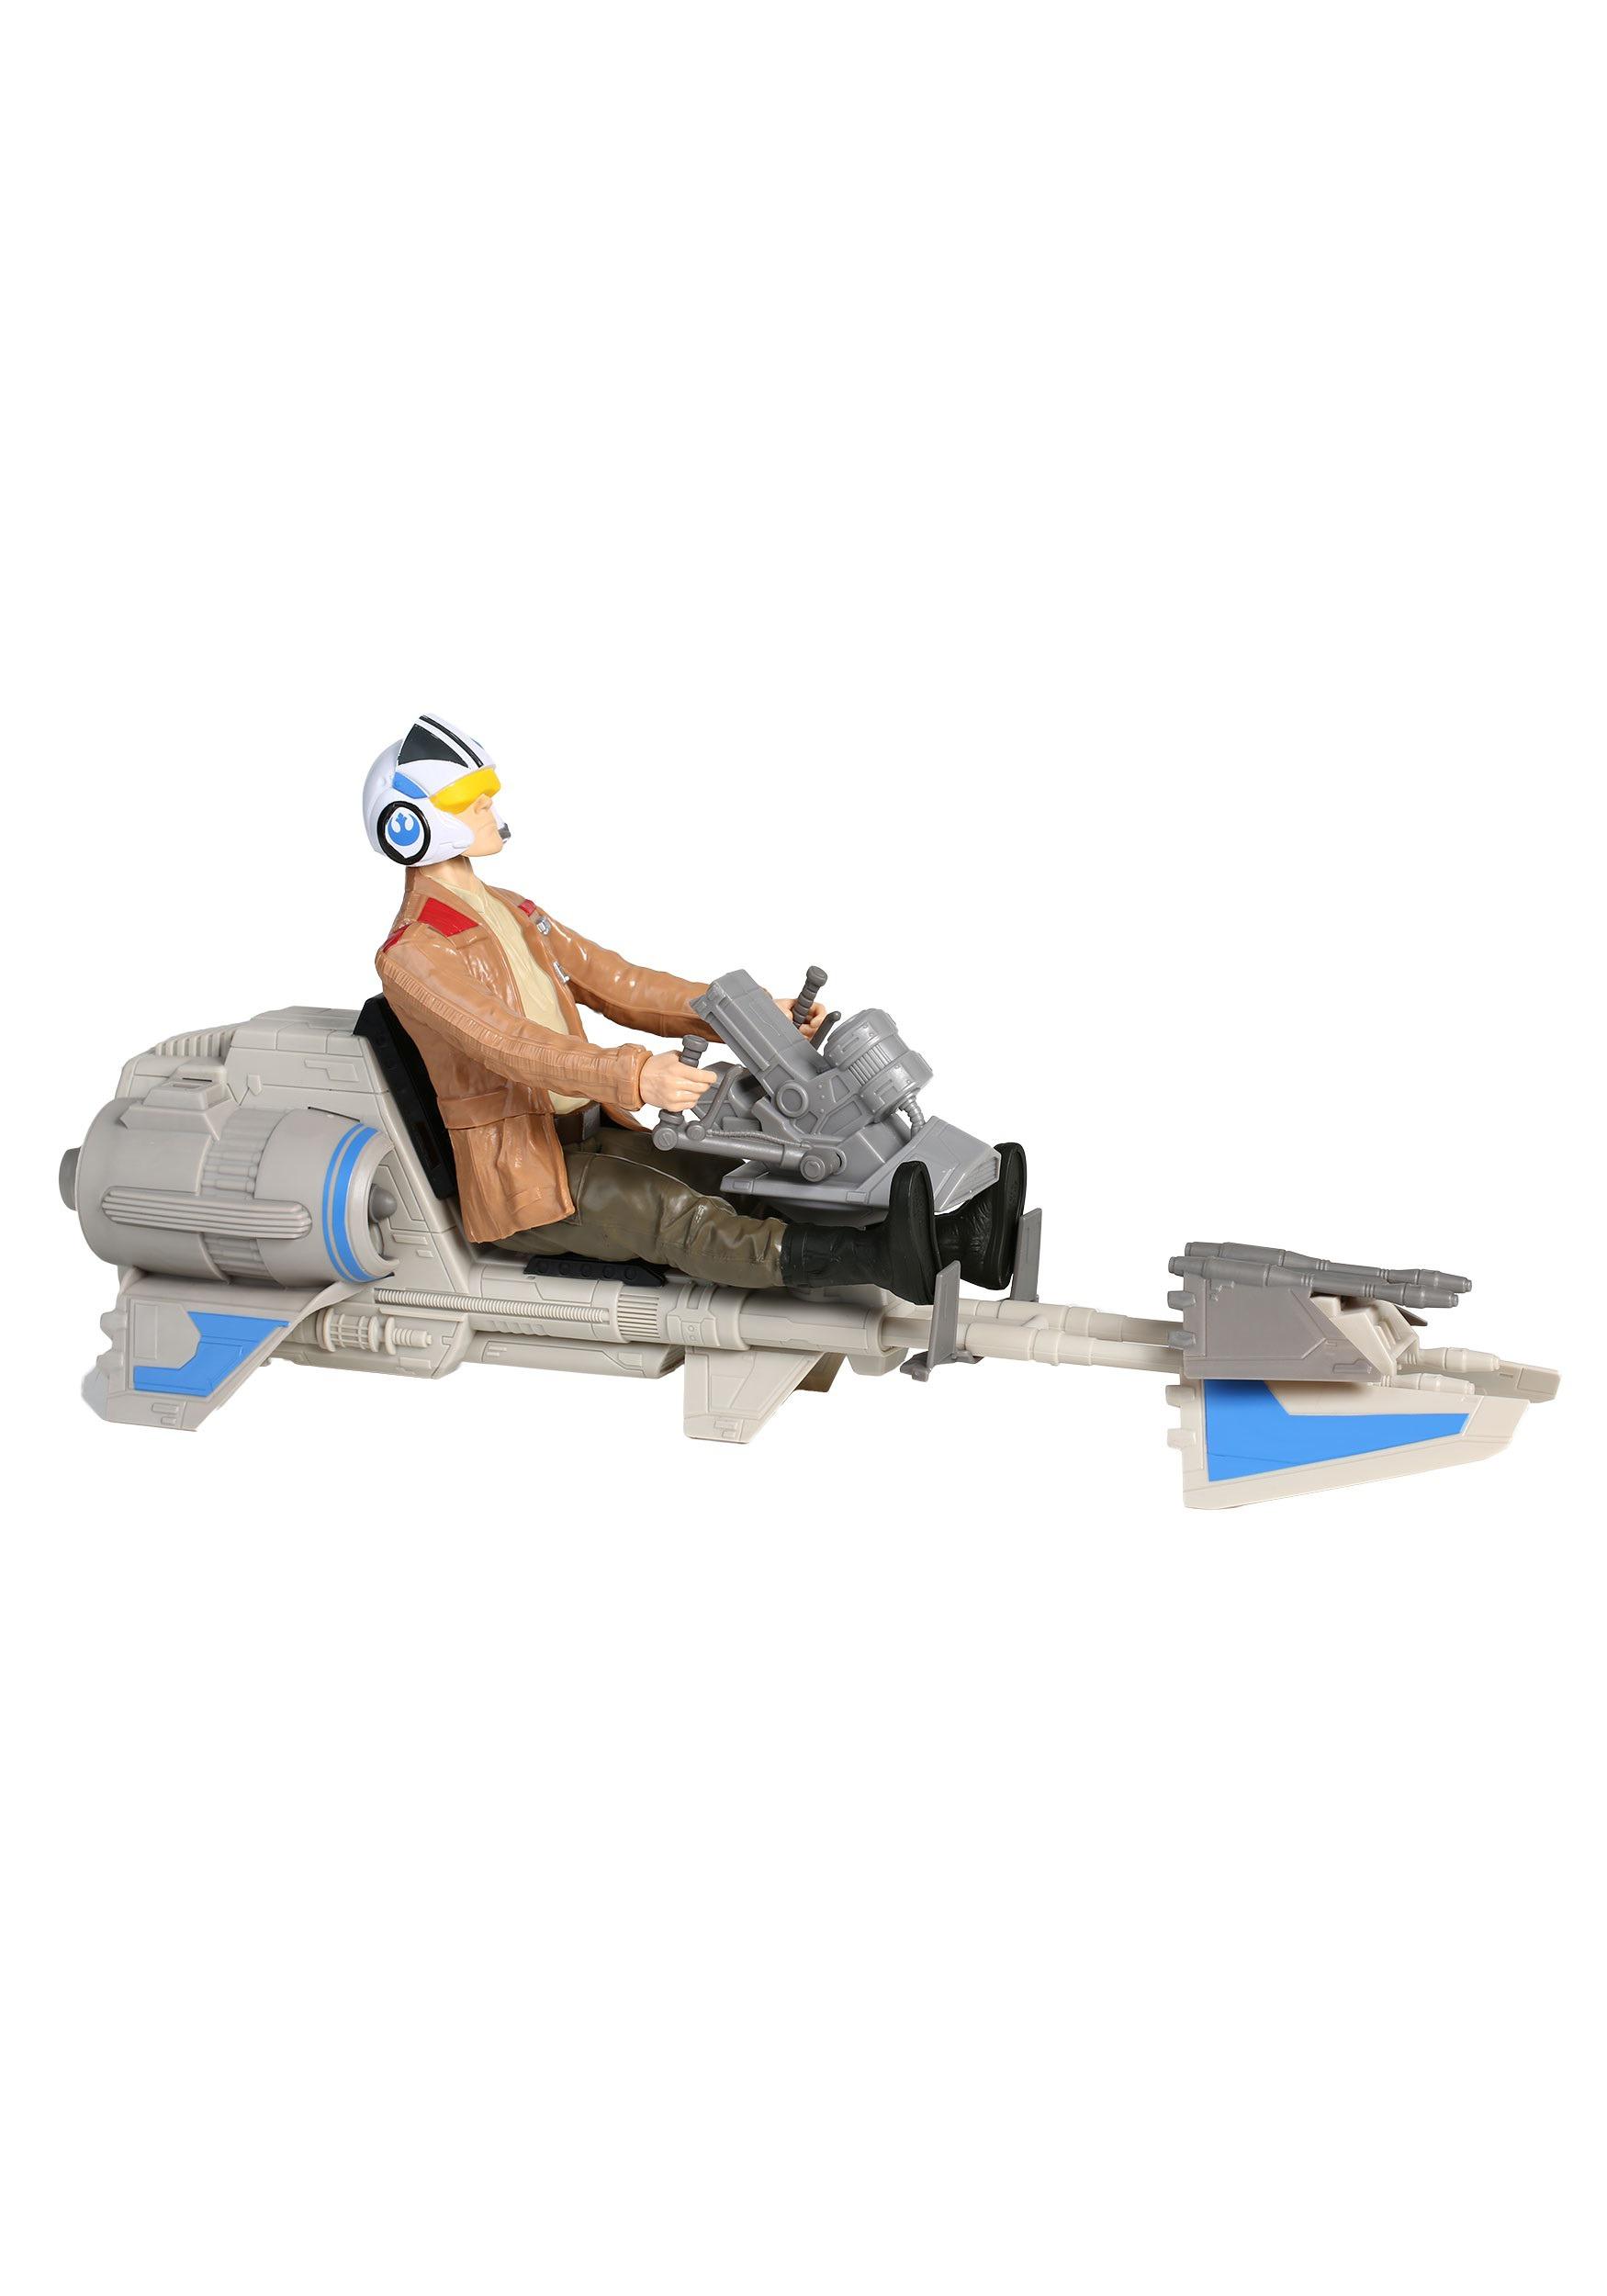 Star Wars Episode 7 Speeder Bike with Poe Dameron Figure EEDSPEEDERPOE